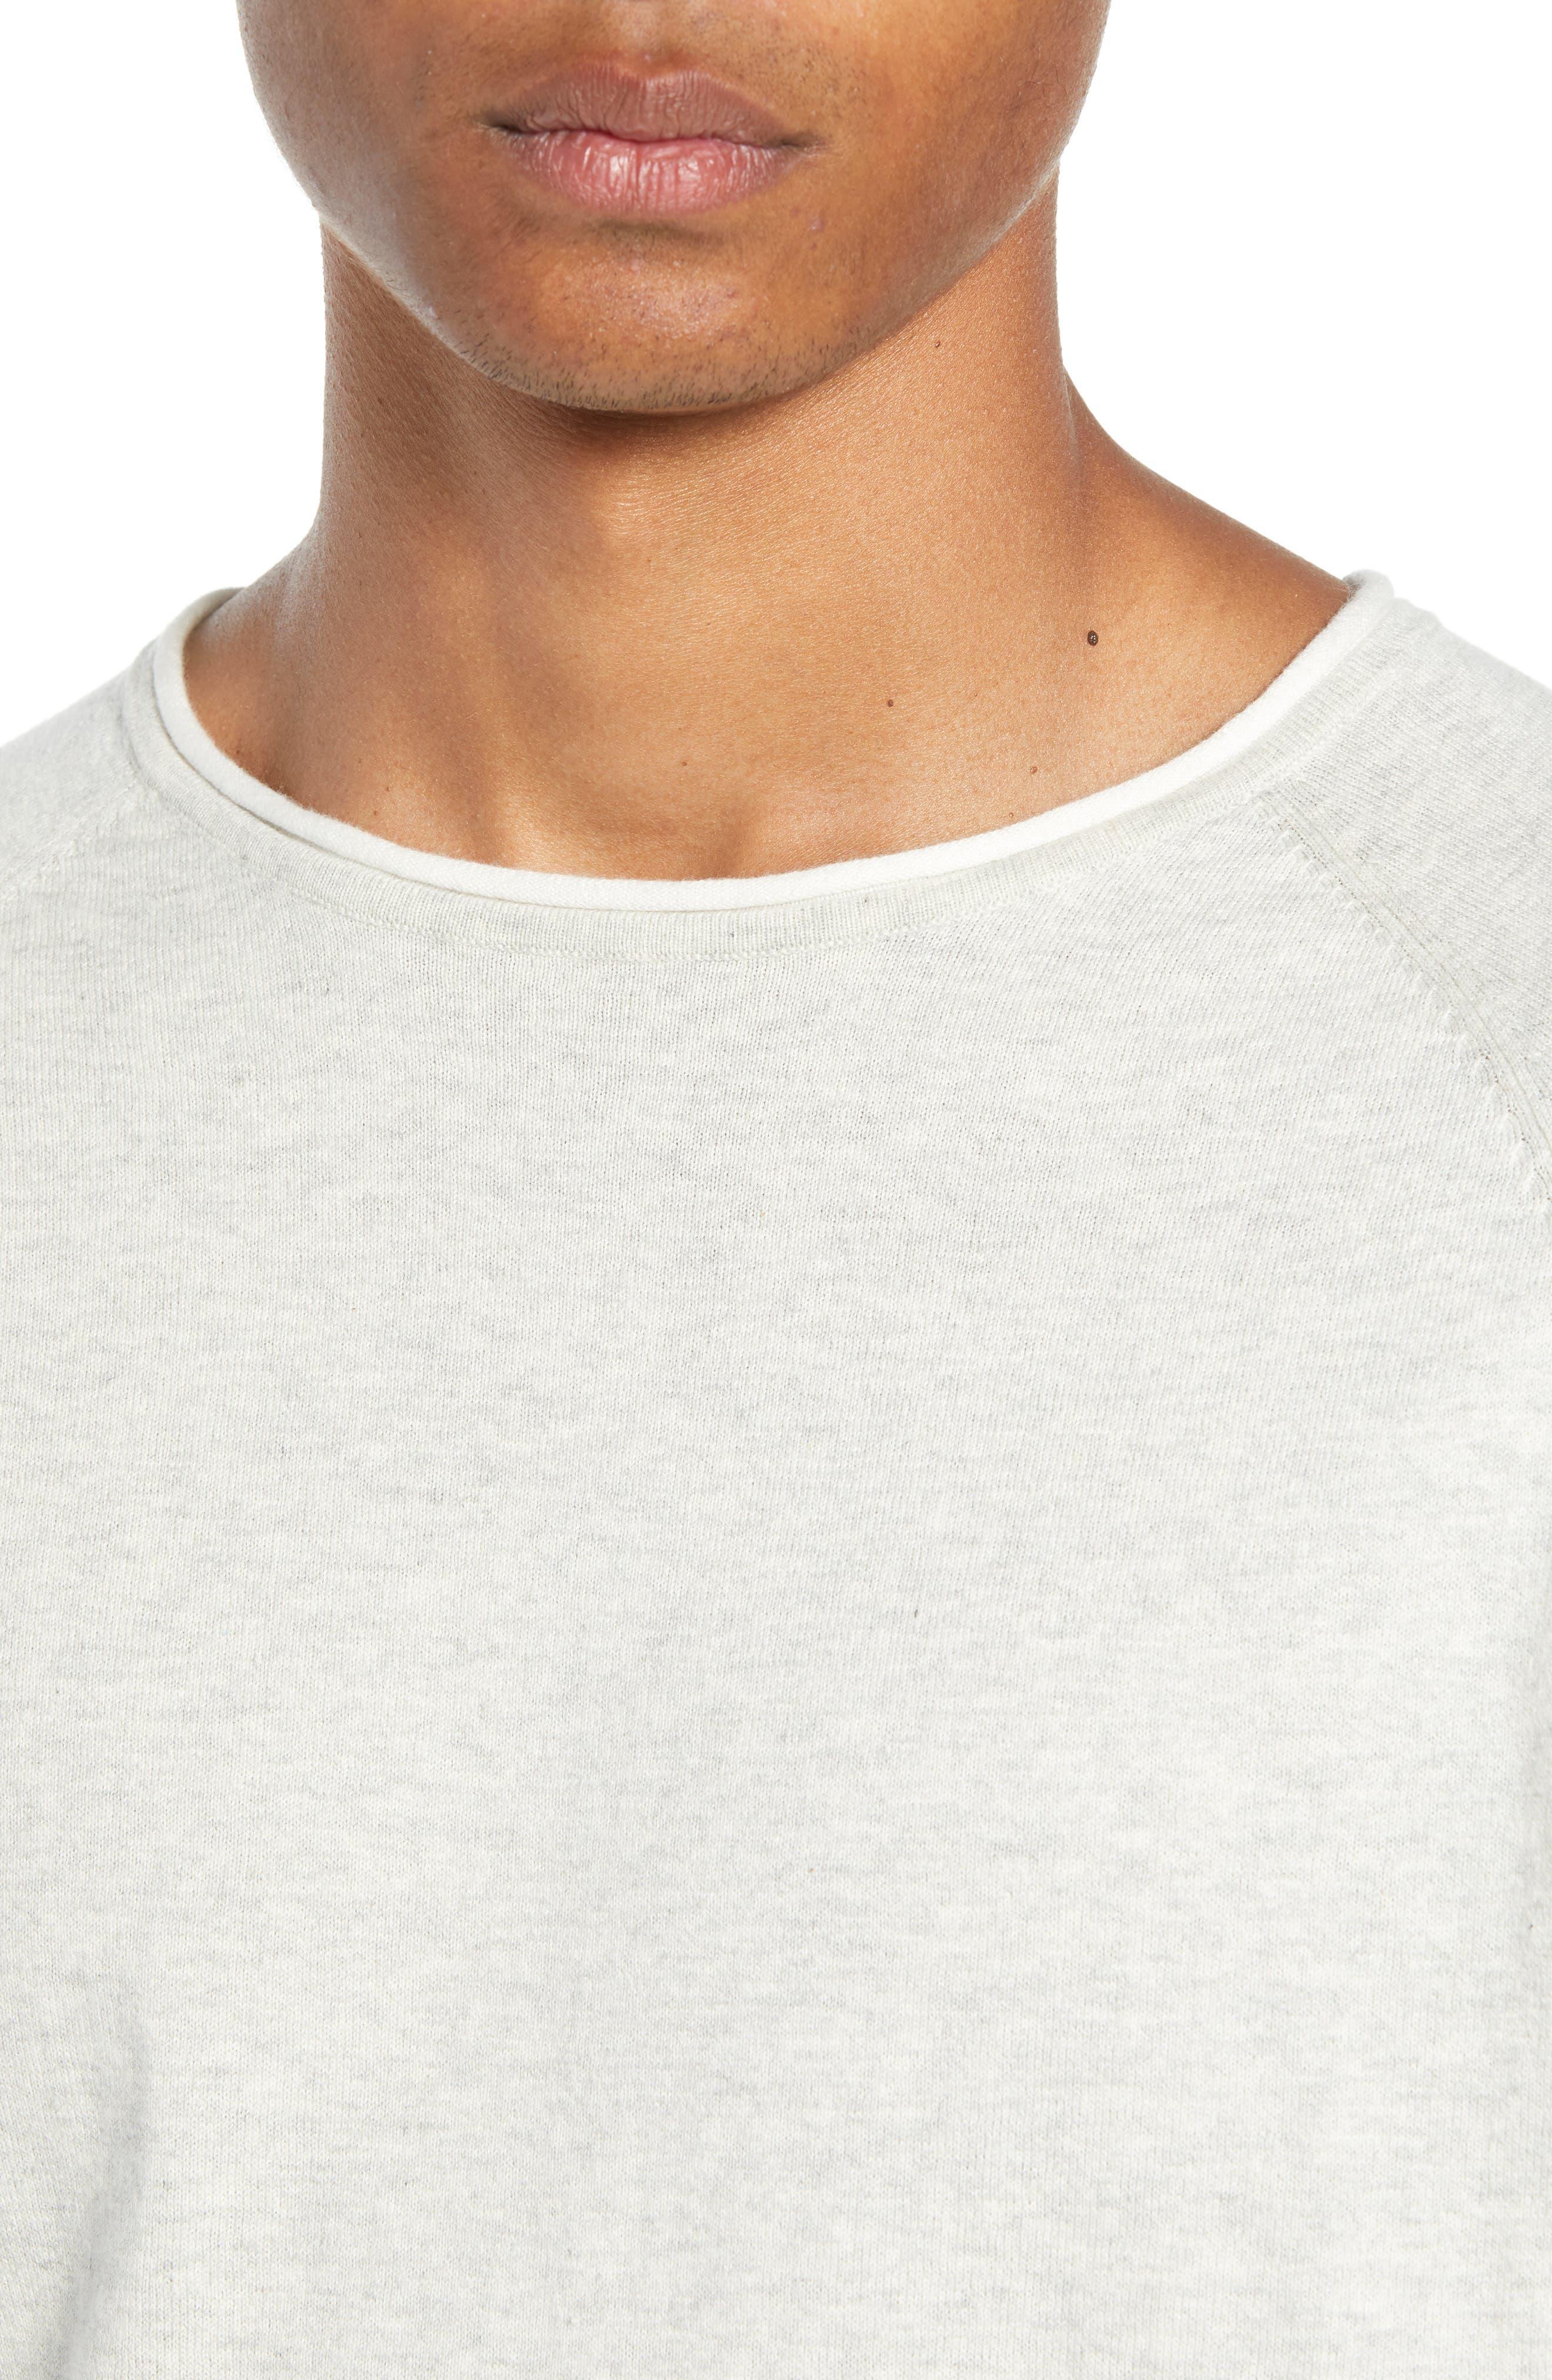 Crewneck Sweatshirt,                             Alternate thumbnail 4, color,                             BONE WHITE MELANGE